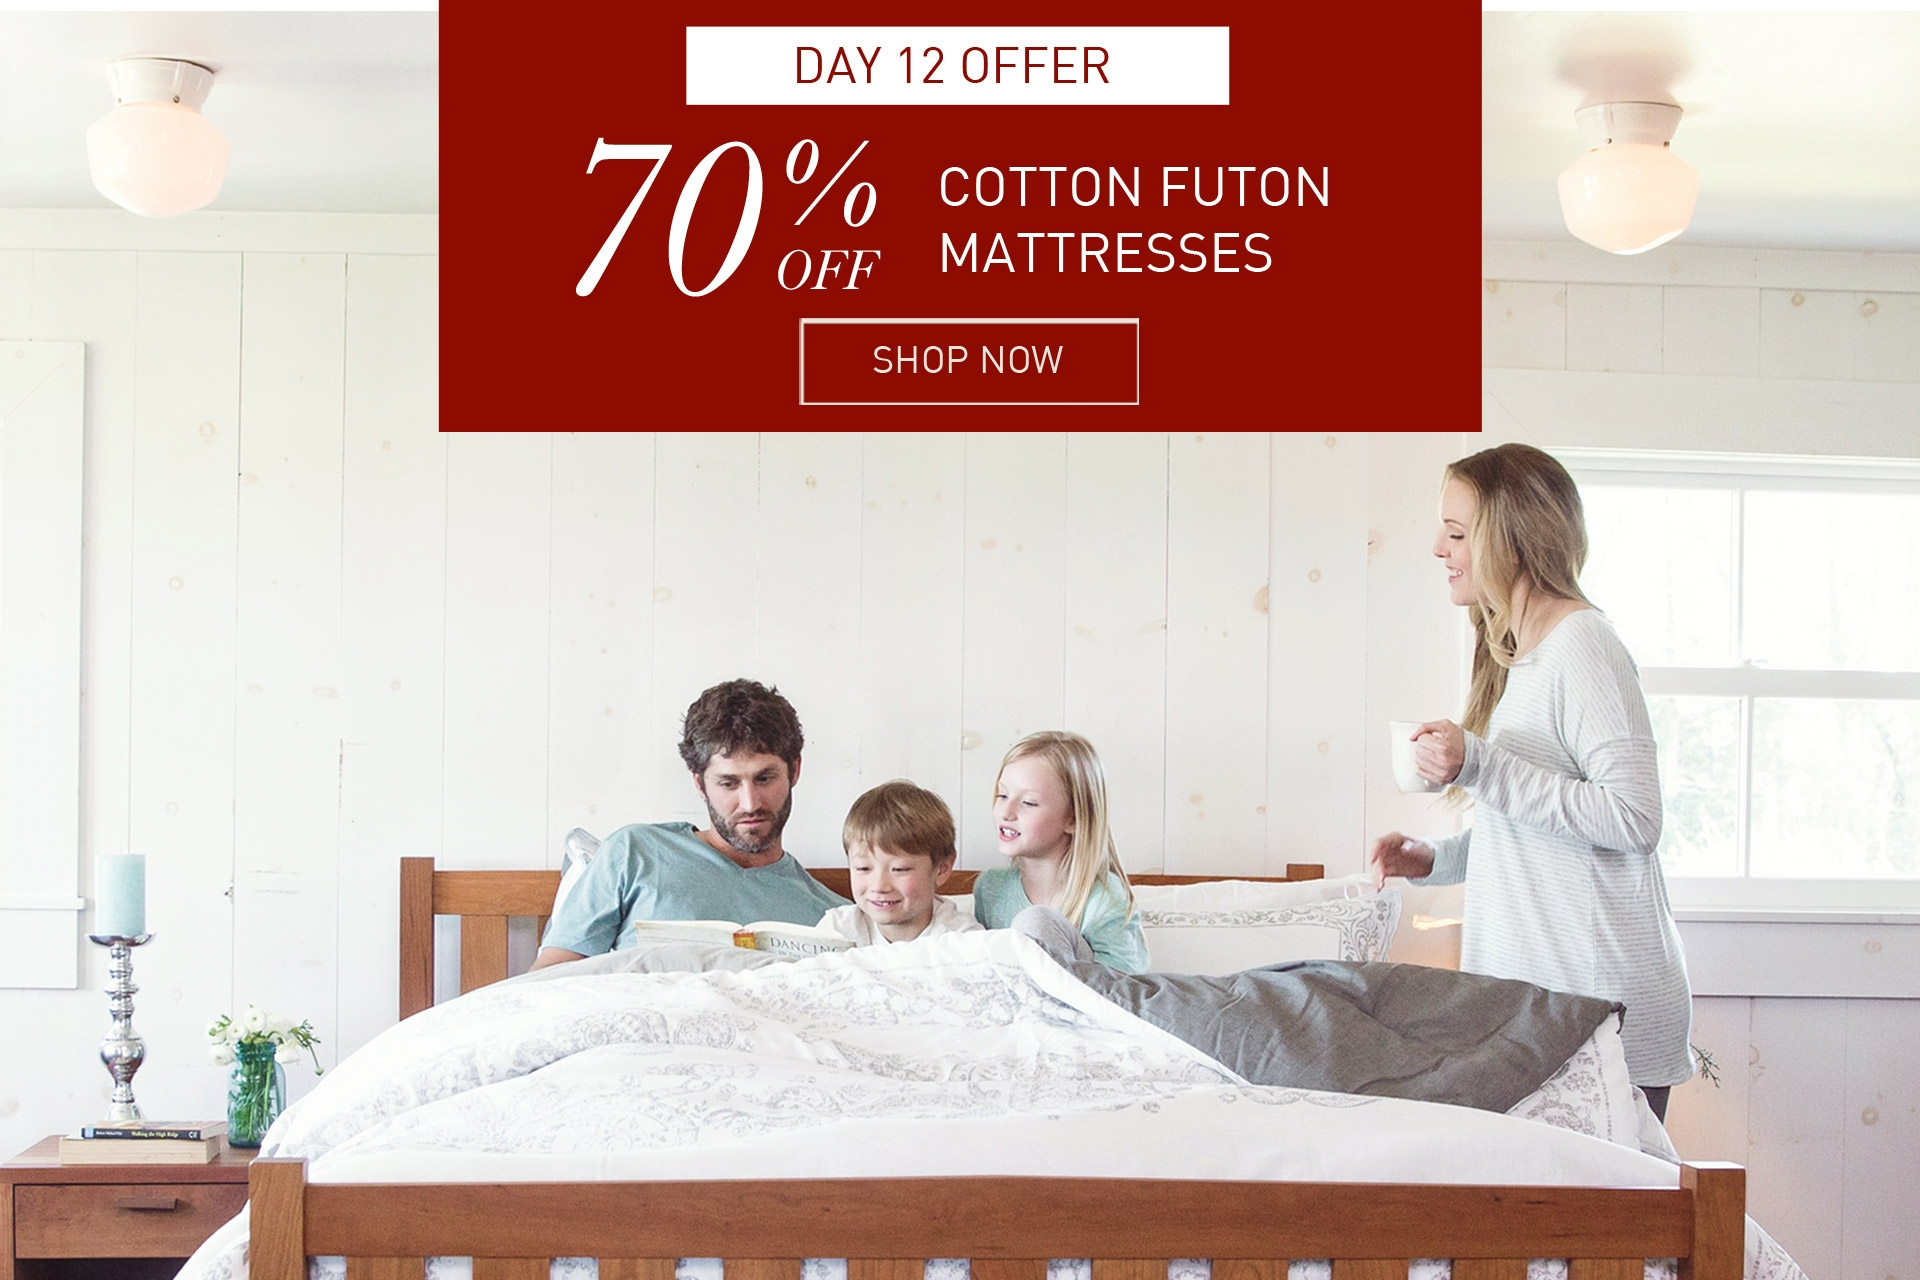 cotton futon matresses